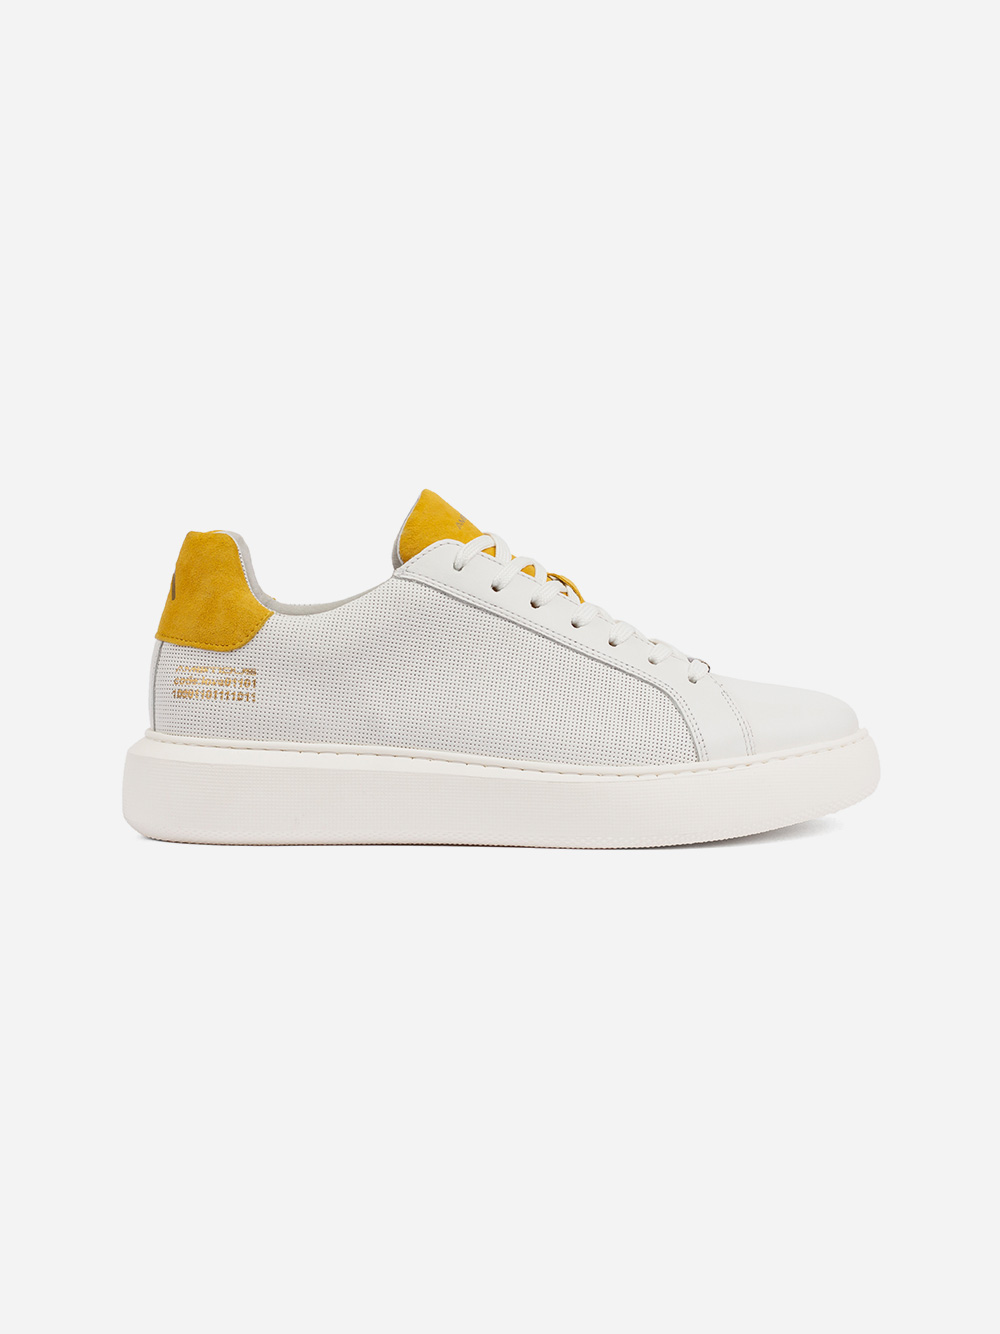 White Sneakers Yellow Detail